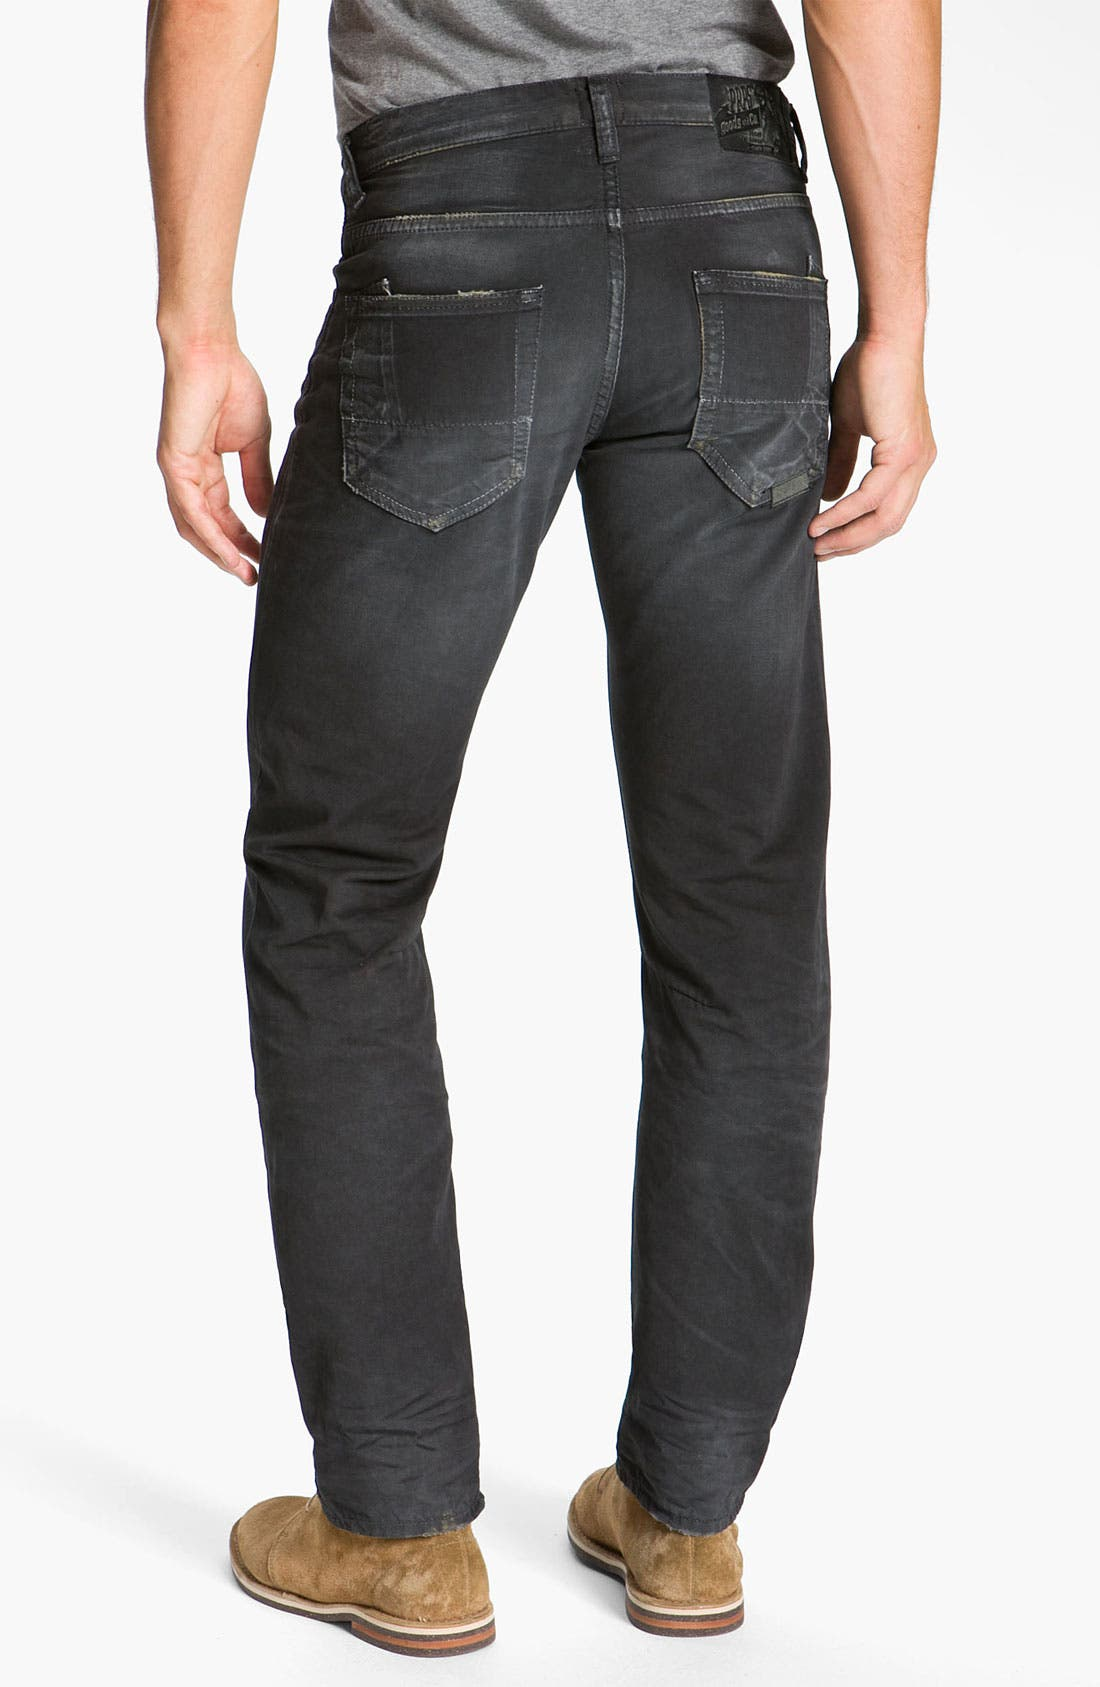 Alternate Image 1 Selected - PRPS 'Rambler' Slim Straight Leg Jeans (Black)